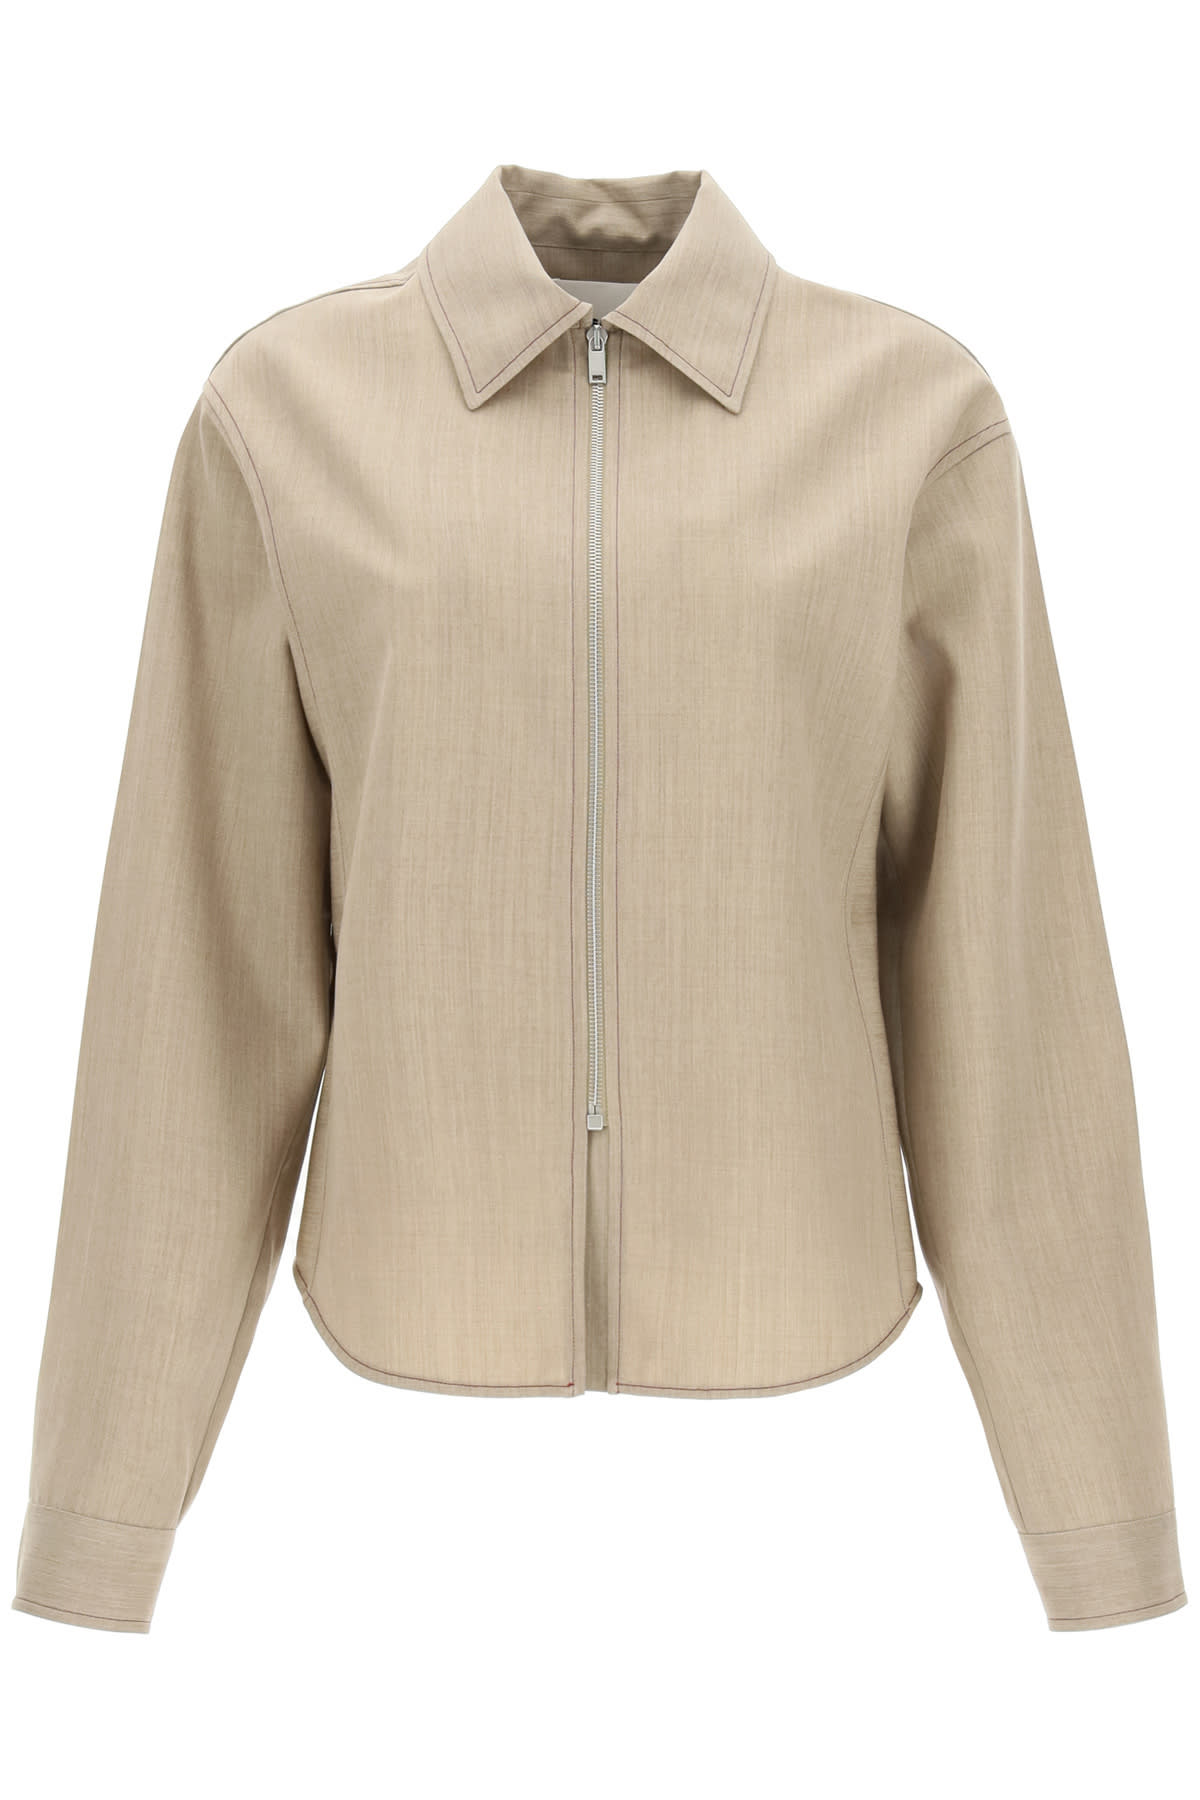 Jil Sander Wool Shirt With Zip